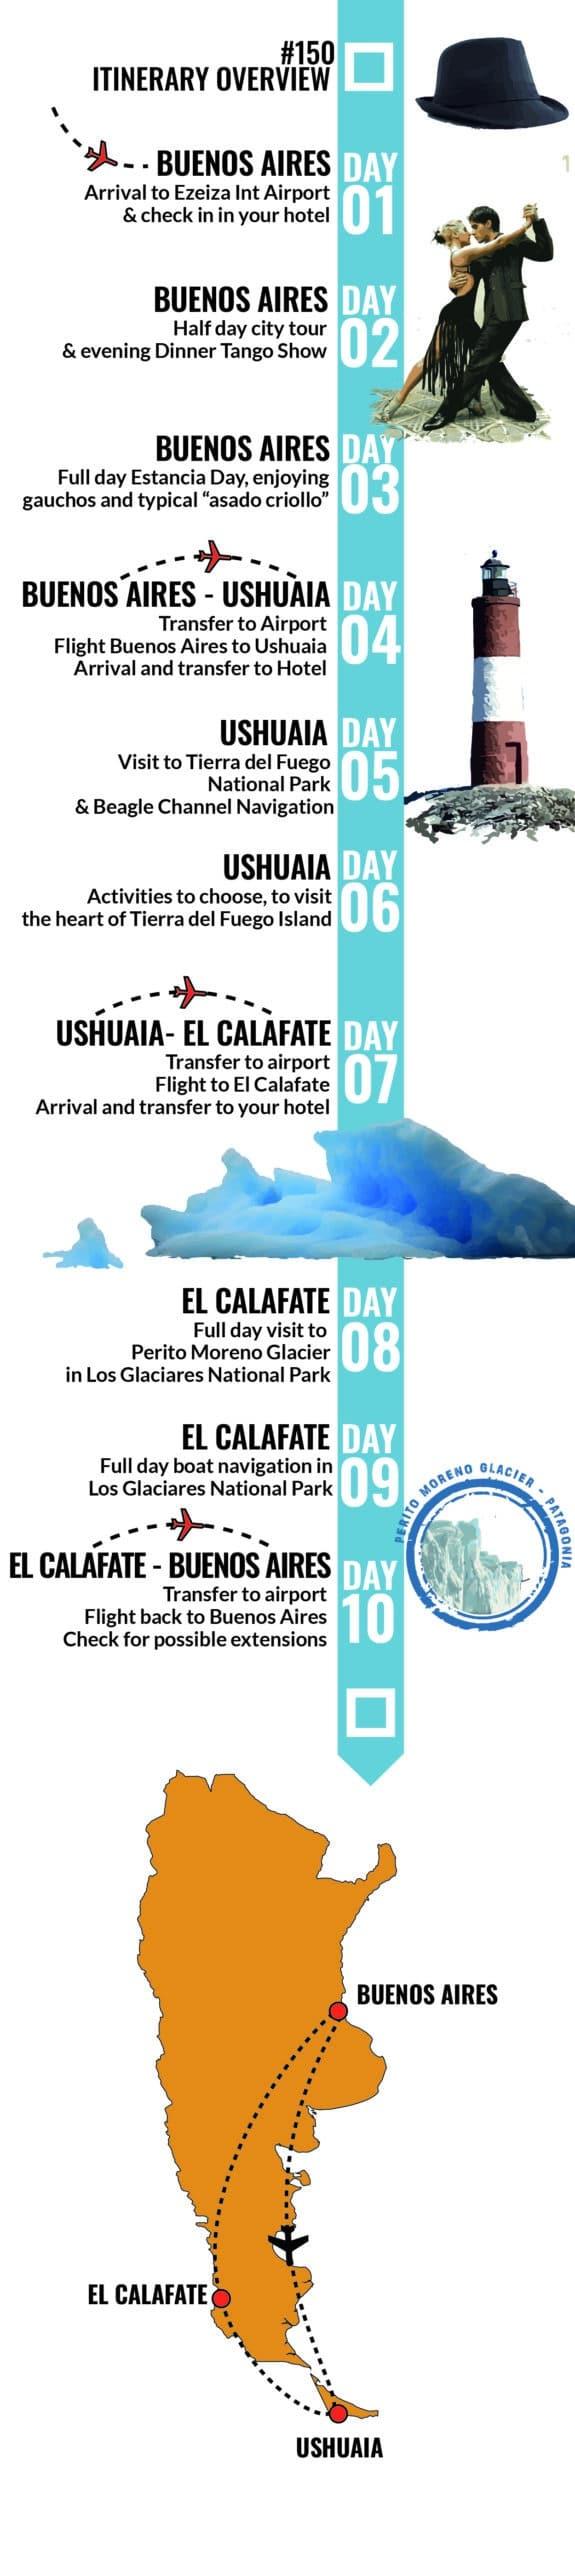 150 Buenos Aires, Ushuaia and El Calafate, tour by RipioTurismo DMC for Argentina